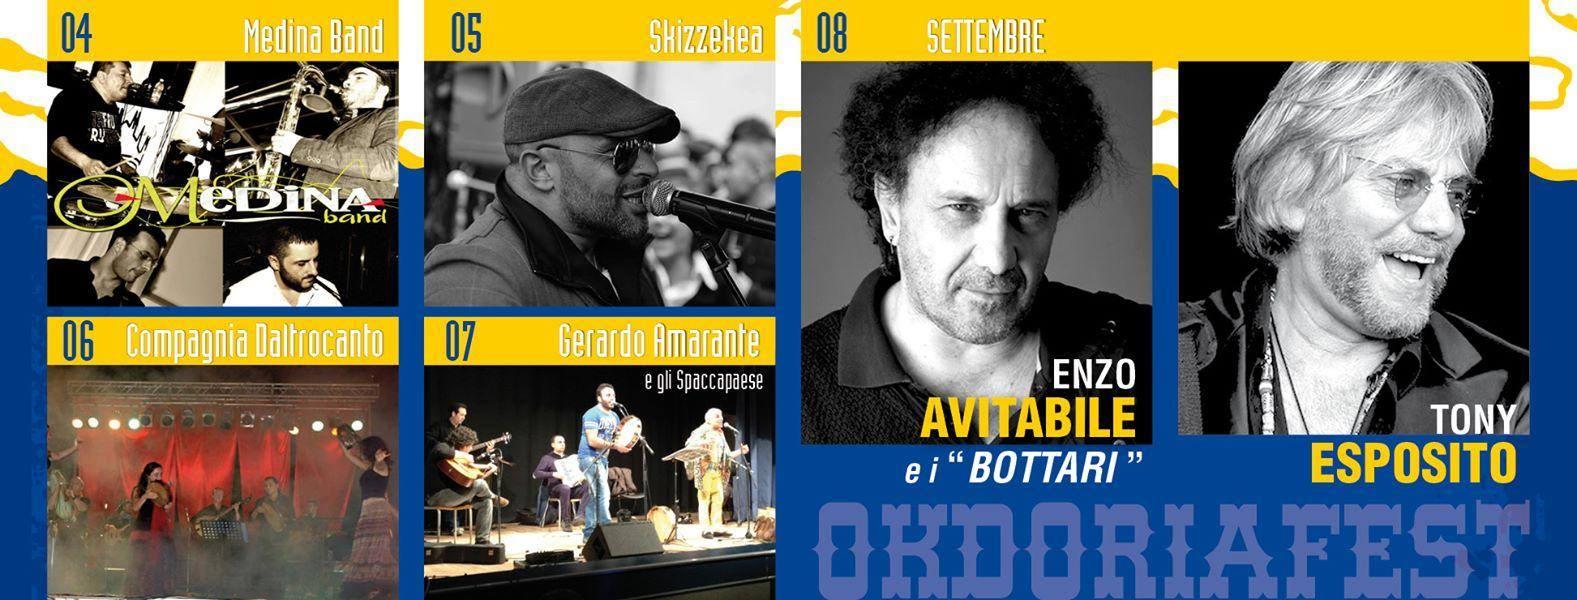 Okdoria Fest - Musica Popolare Italiana